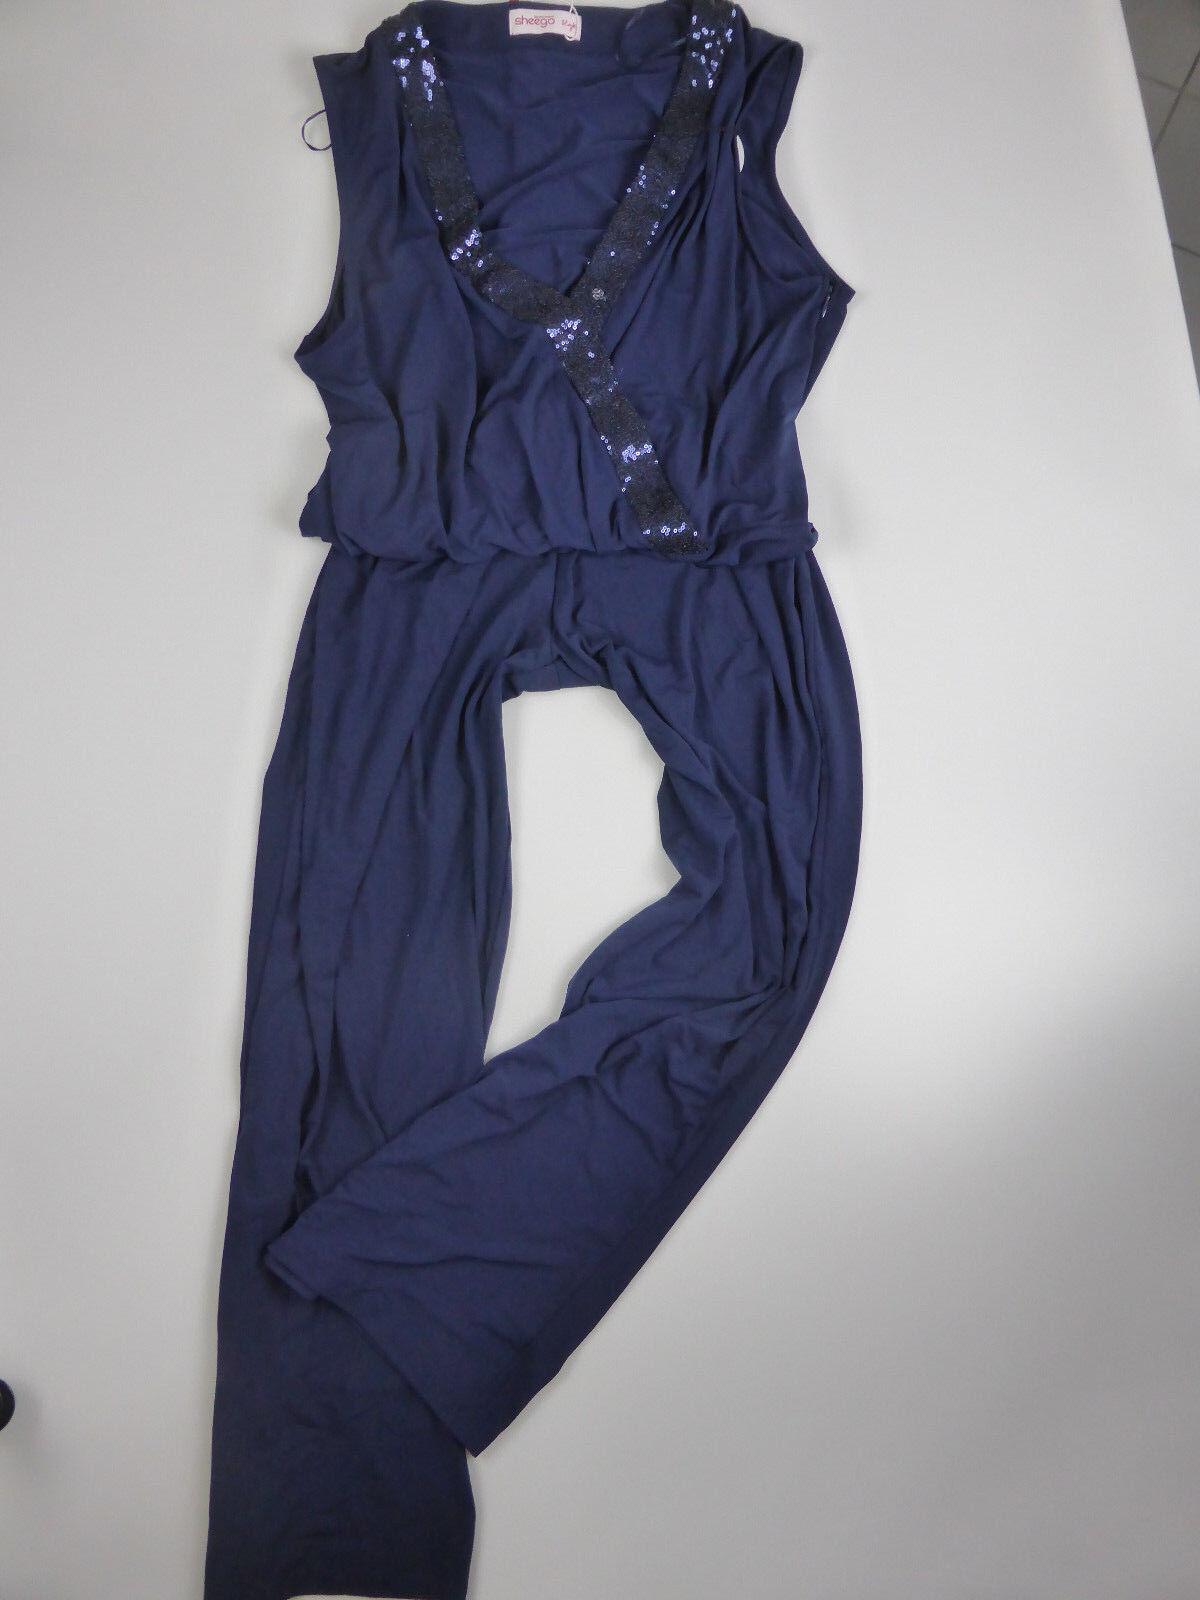 Sheego Jumpsuit Anzug Gr. 40 - 58 mit Pailletten (922) (426) Kurz u. Long Größen